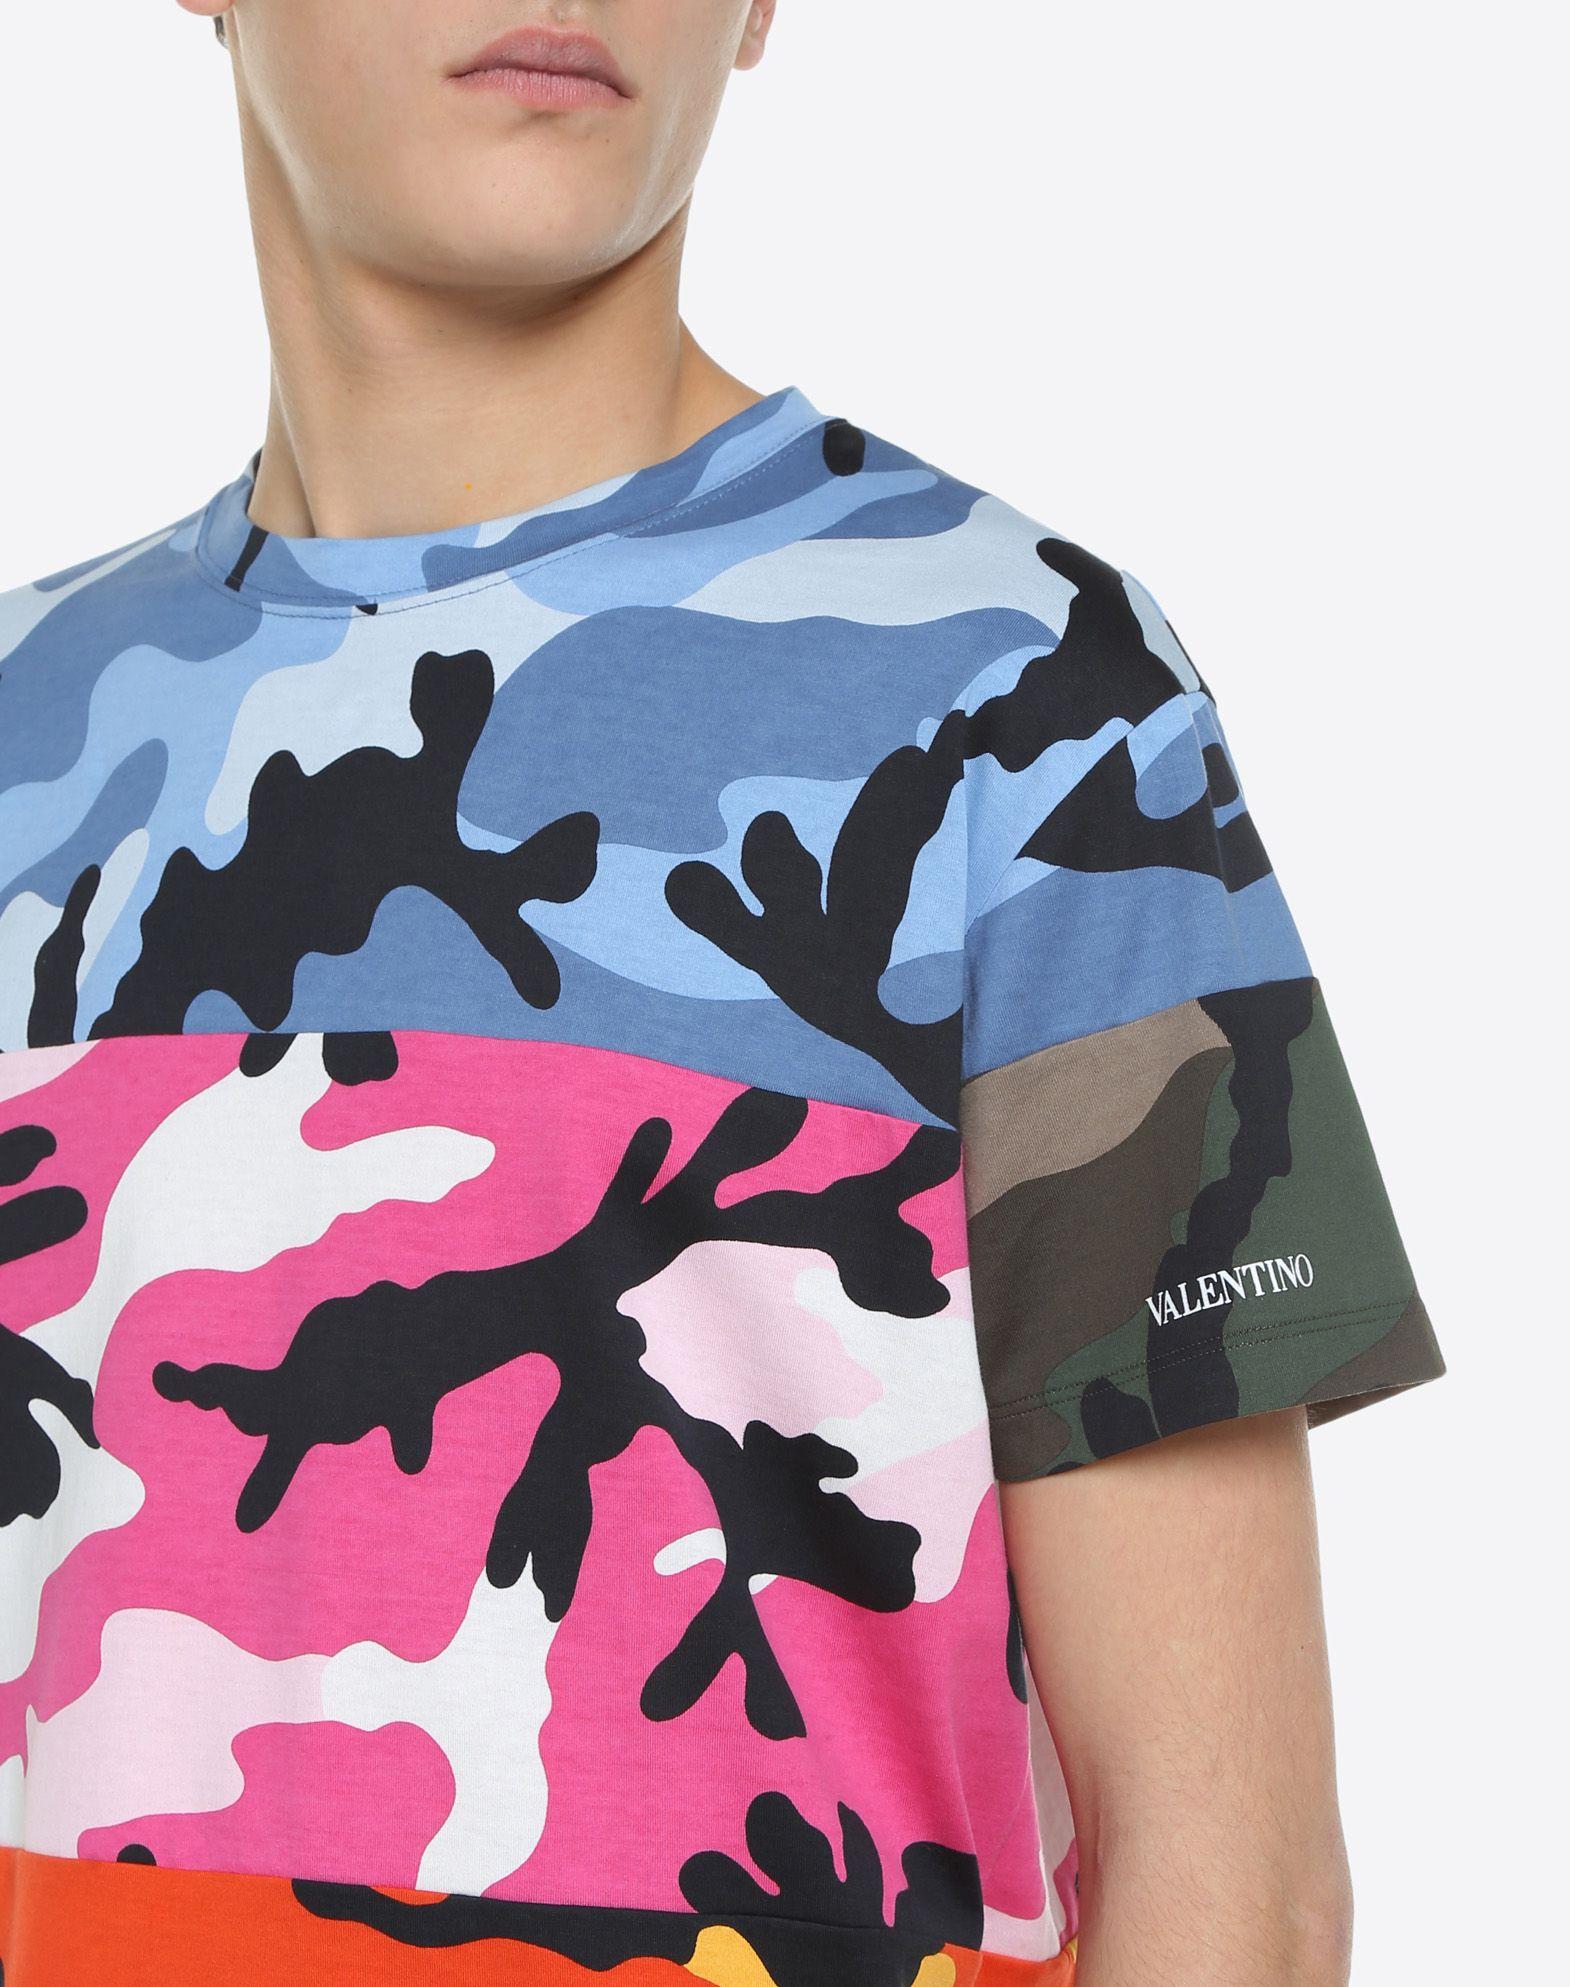 VALENTINO CamoushuffleT-shirt  T-shirt U a